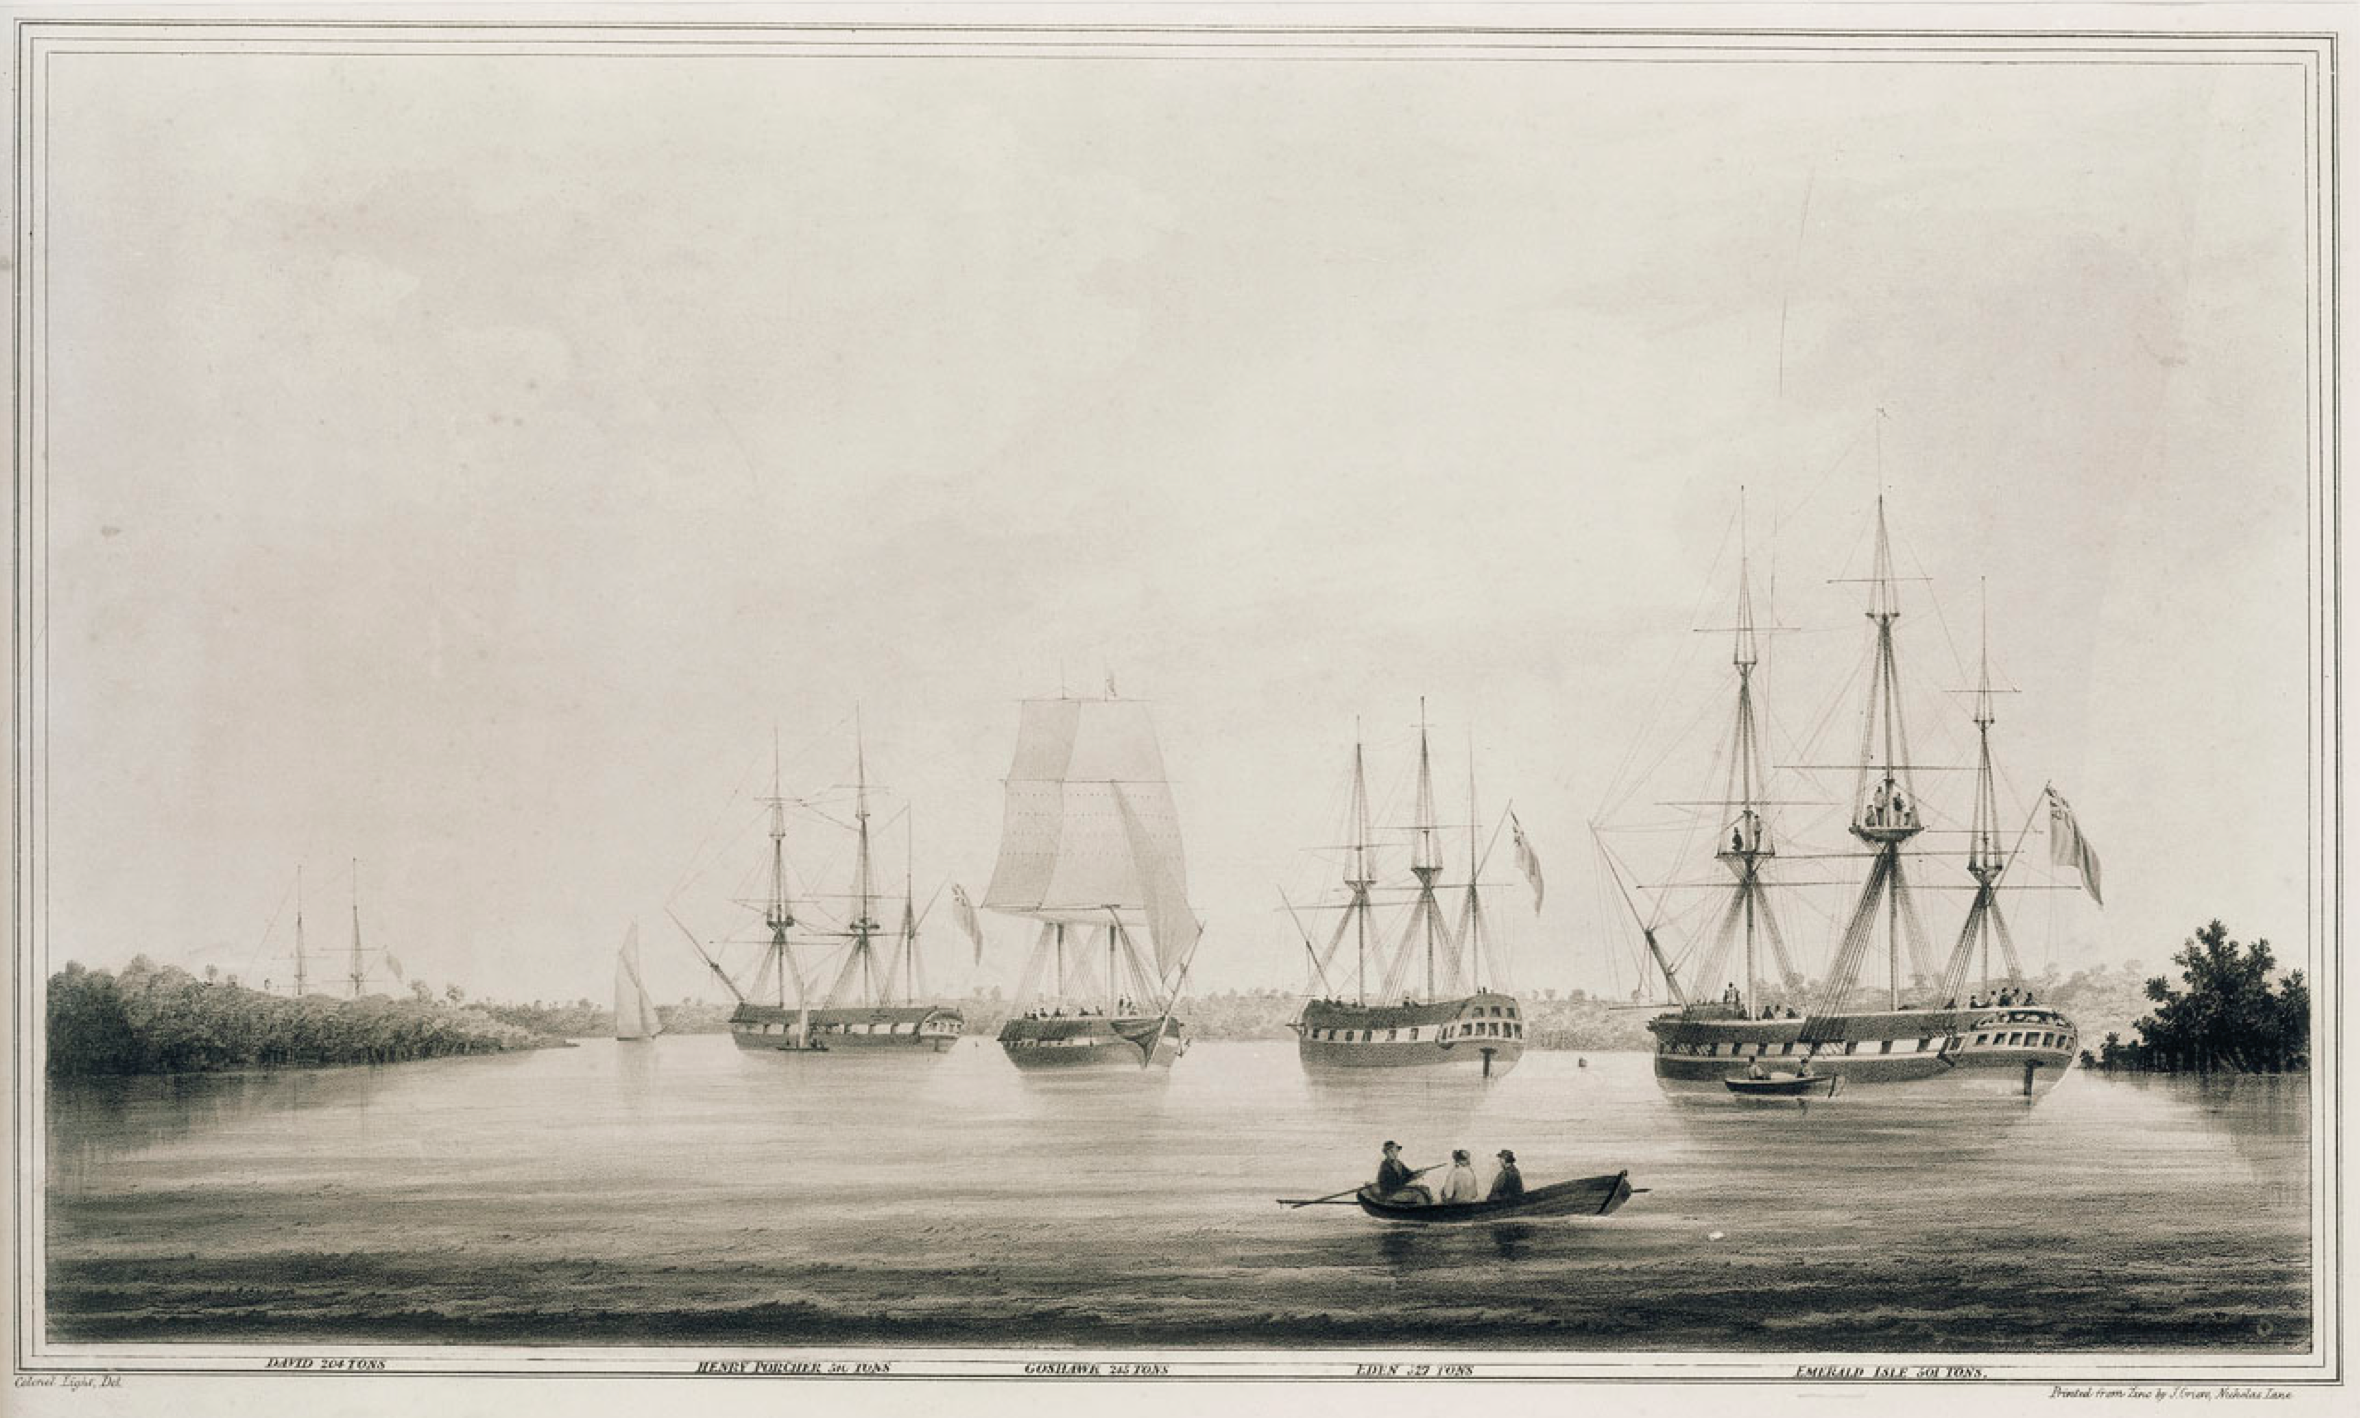 Henry Porcher, former convict ship, in Port Adelaide, South Australia